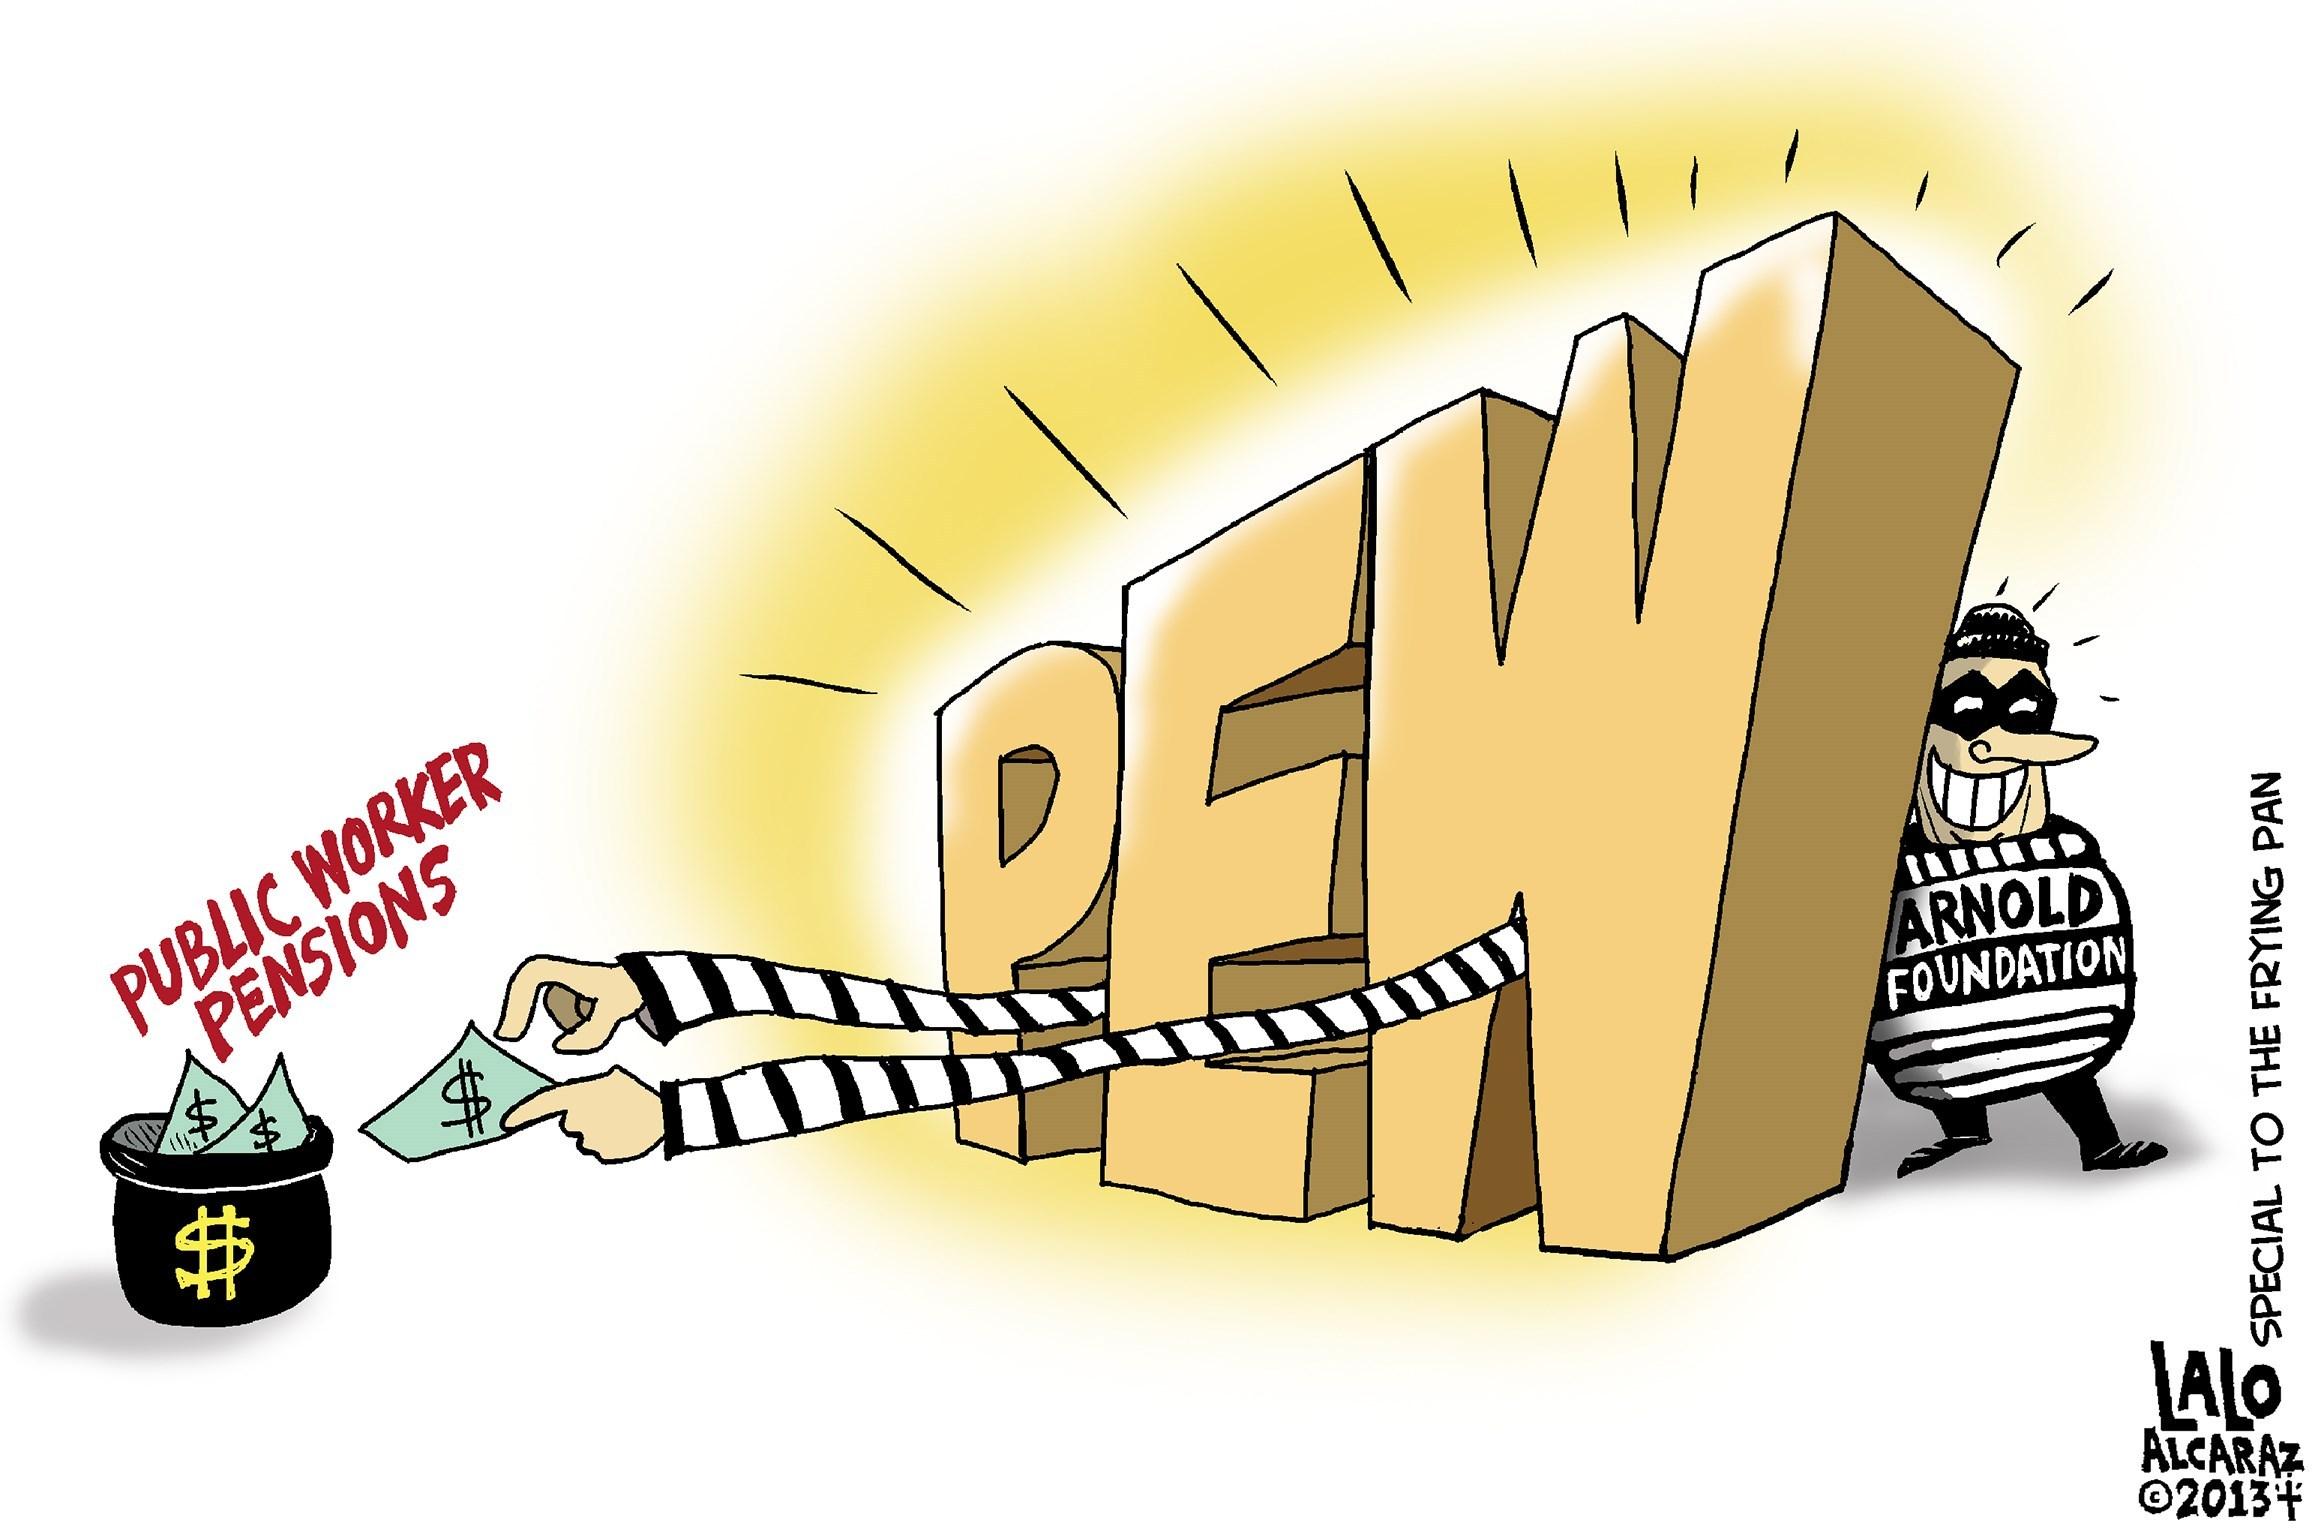 pew trusts arnold foundation